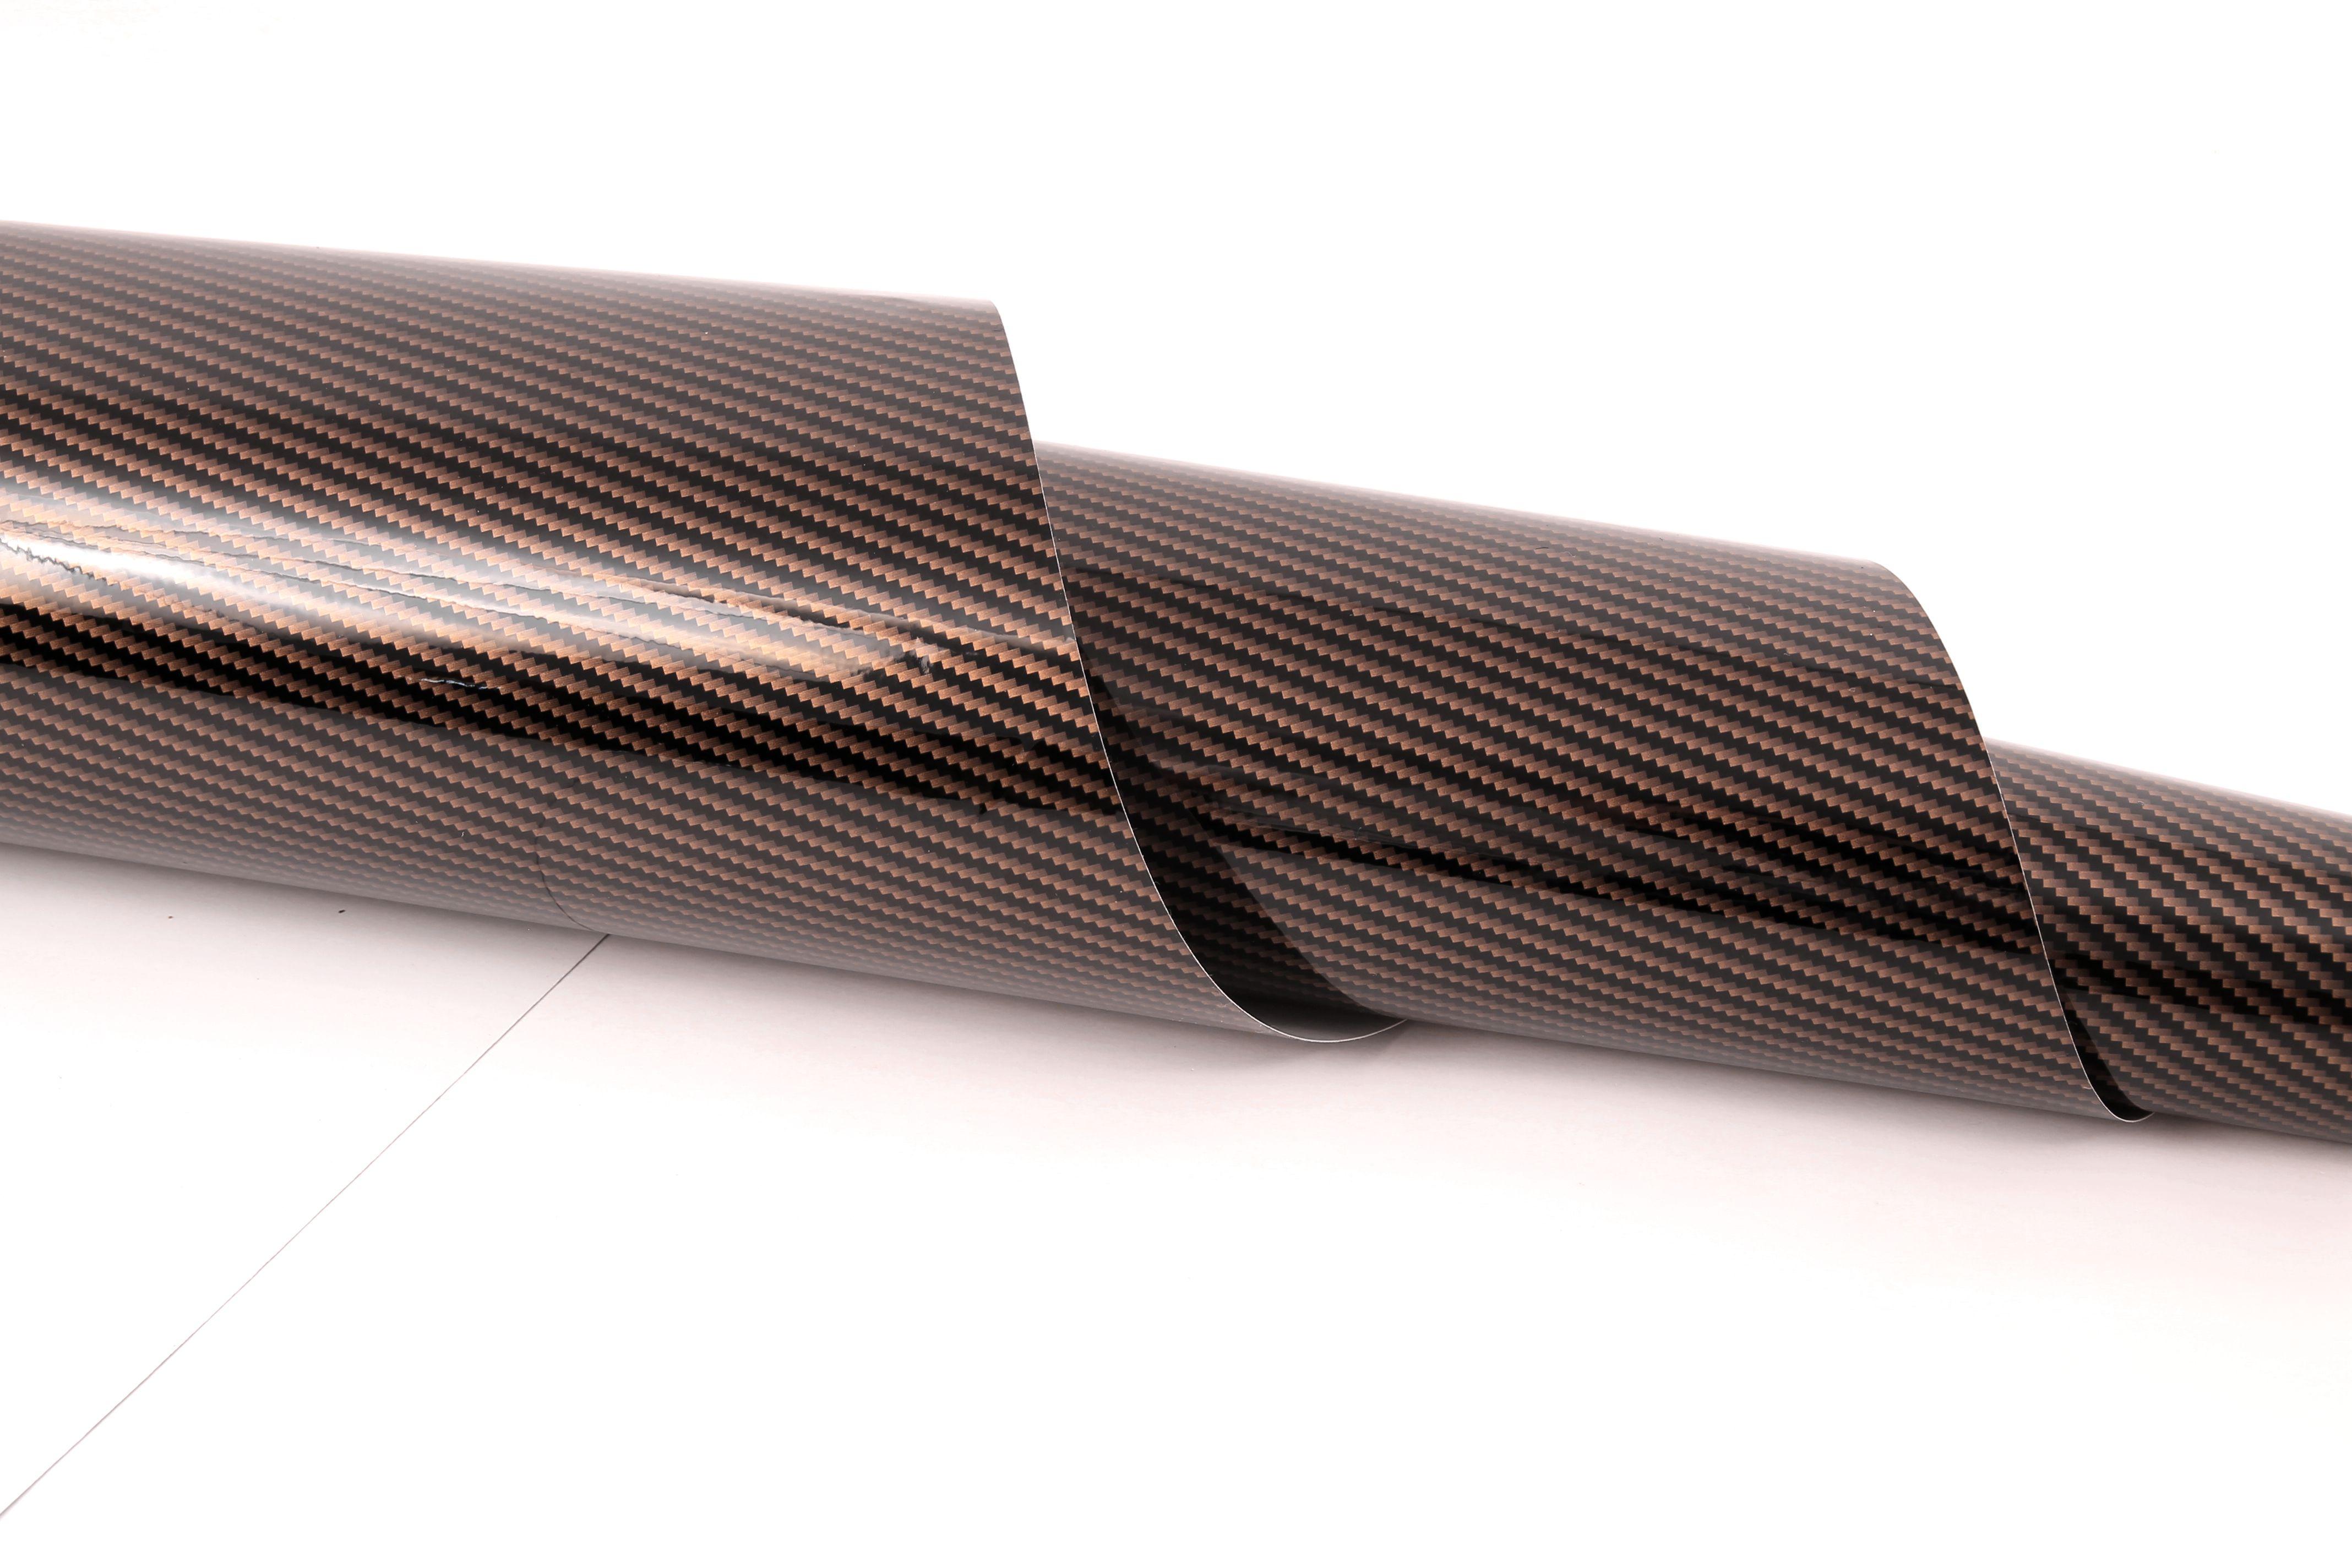 glossy carbon folie gold schwarz zur verklebung car wrapping. Black Bedroom Furniture Sets. Home Design Ideas